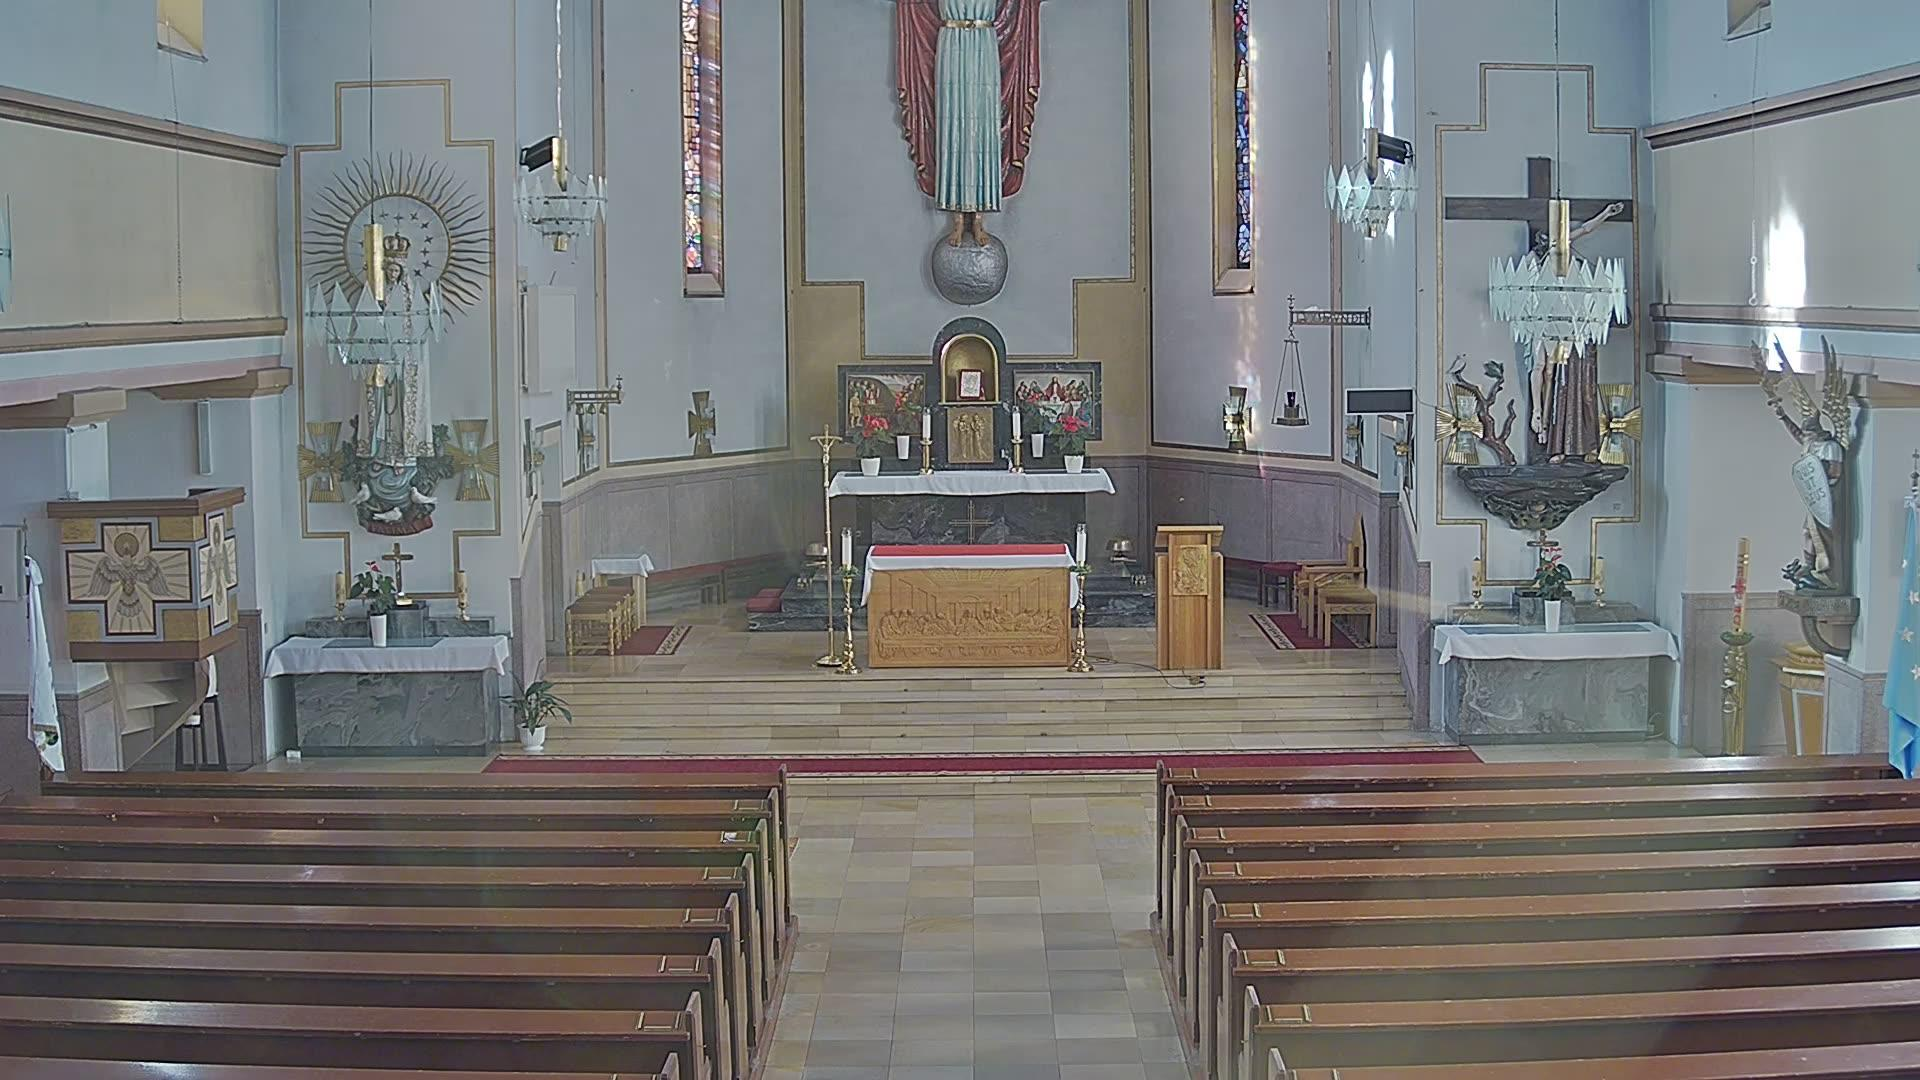 Webcam Komprachcice: Church